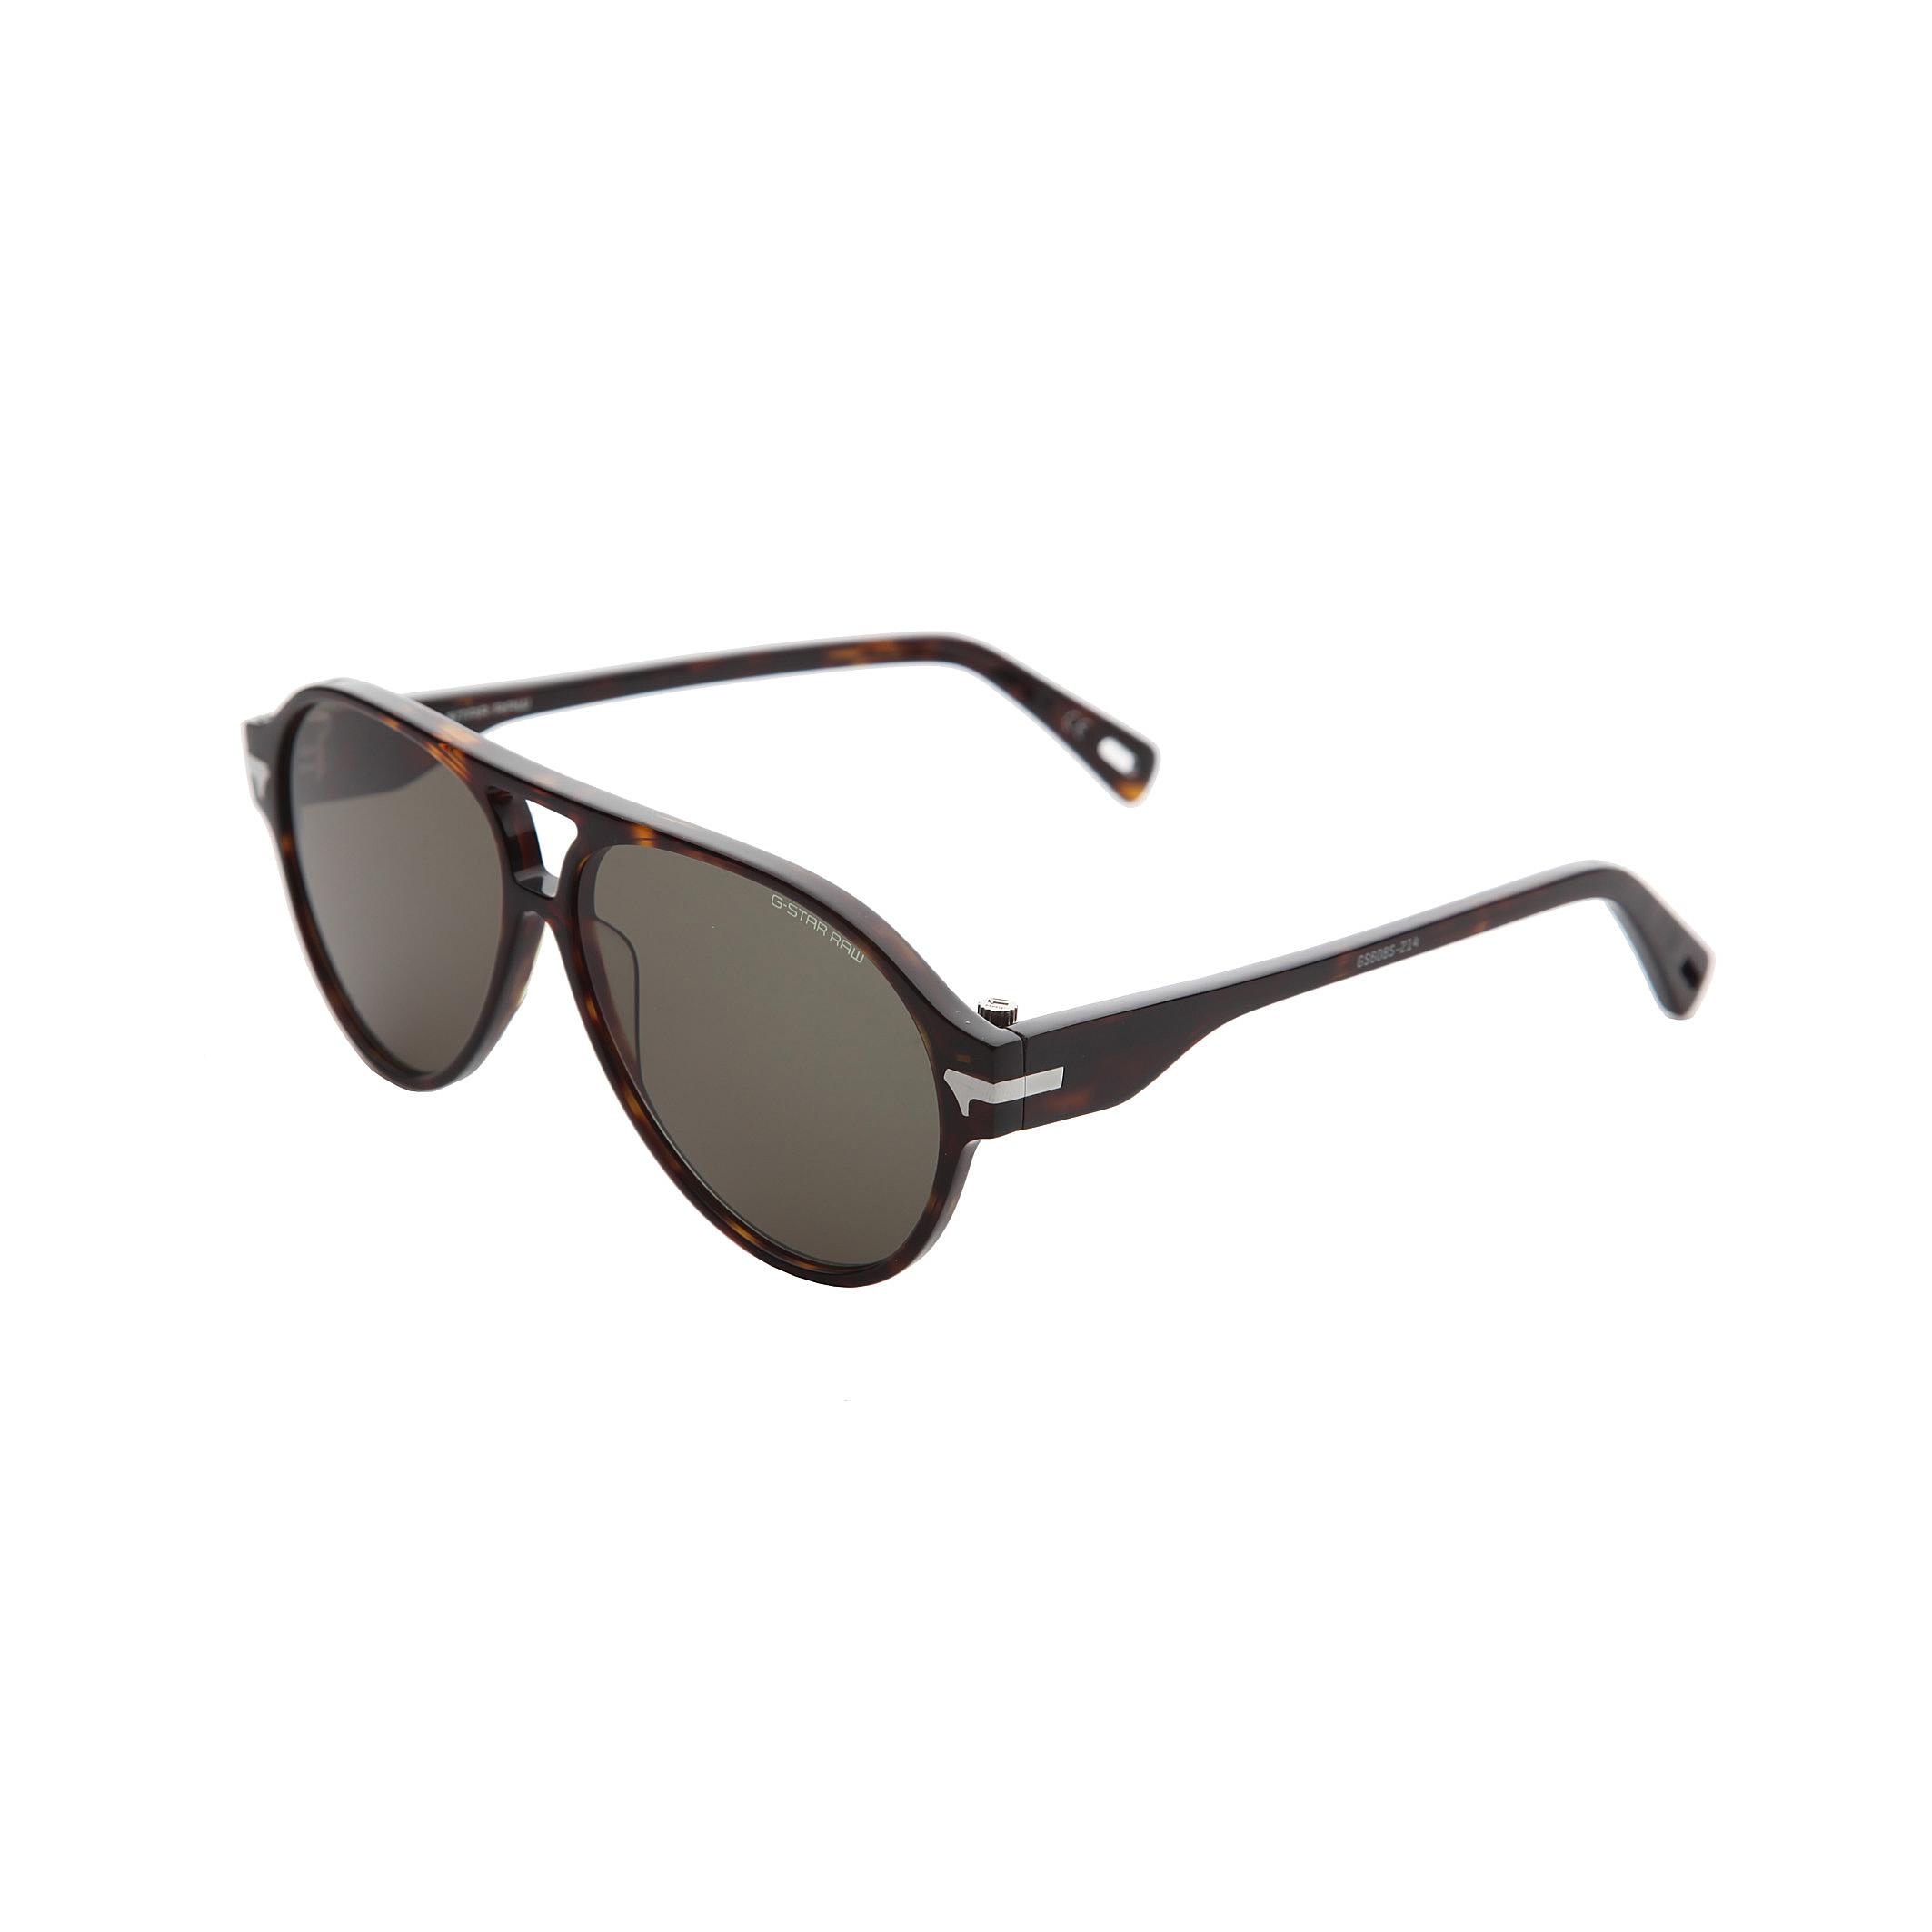 G-Star Mens Thick Frame Aviator Style Sunglasses